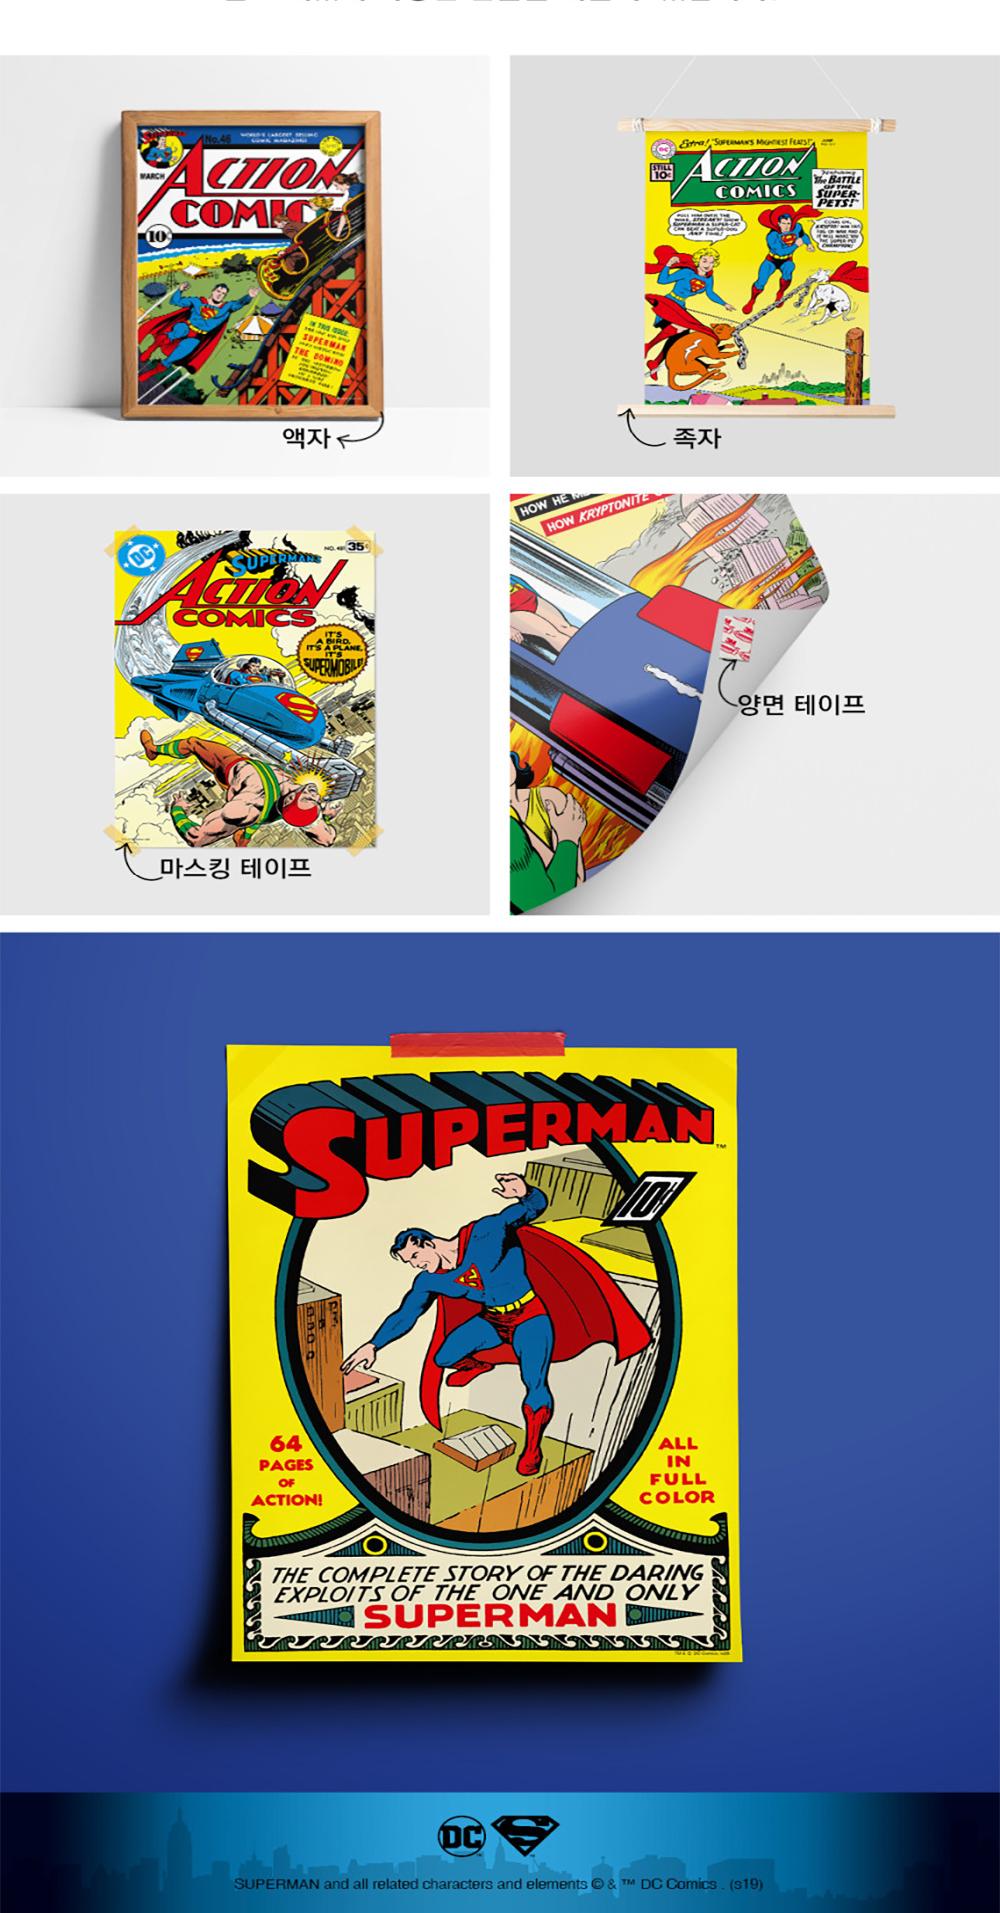 DC코믹스 인테리어 포스터_슈퍼맨_06.jpg